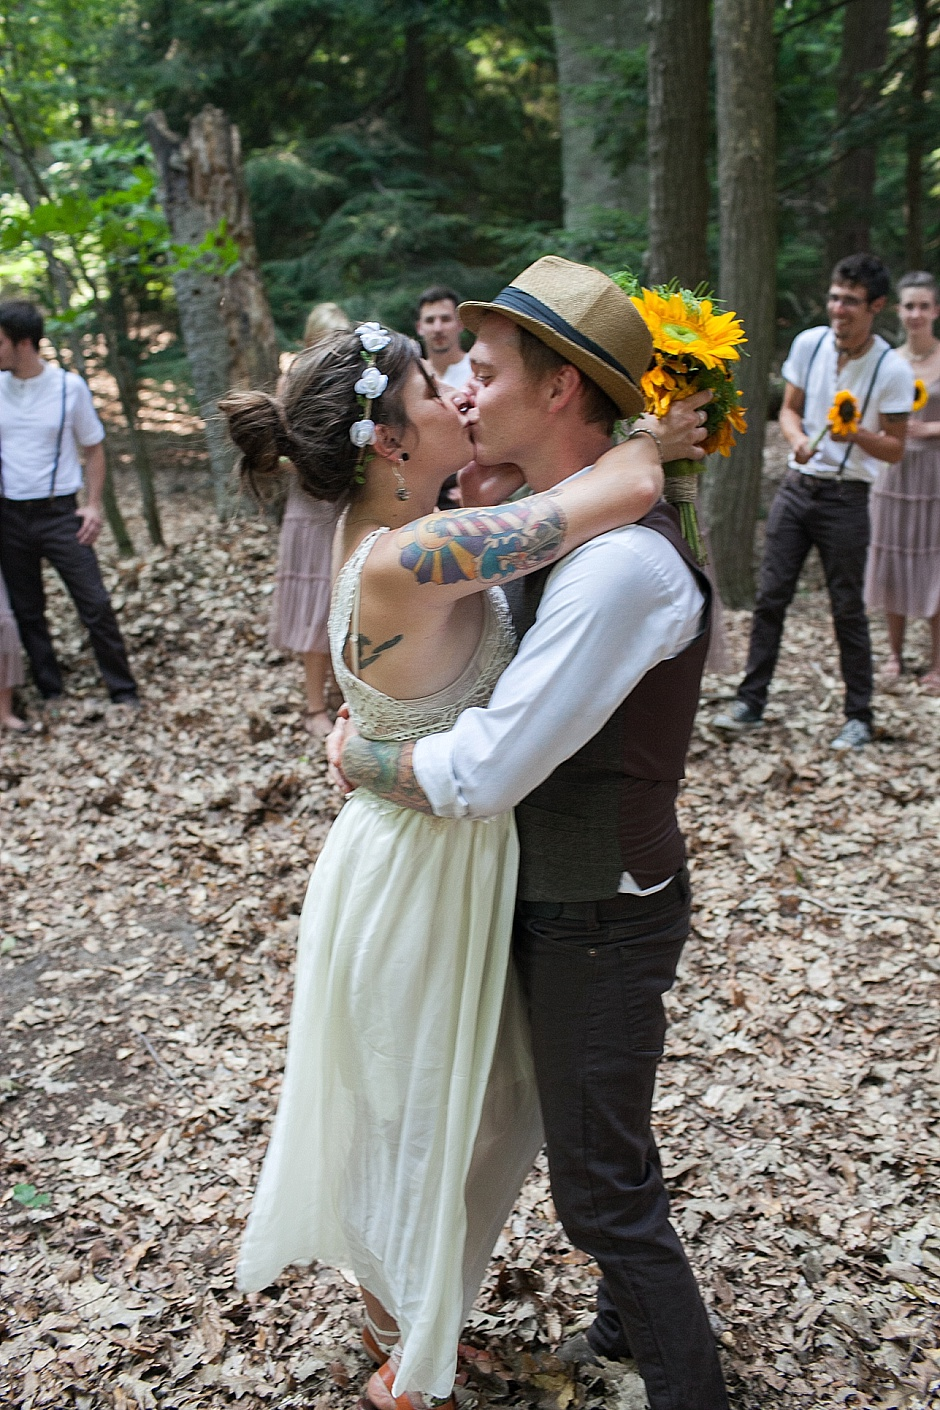 barefootwedding_hudsonvillemi_weddingphotographer095